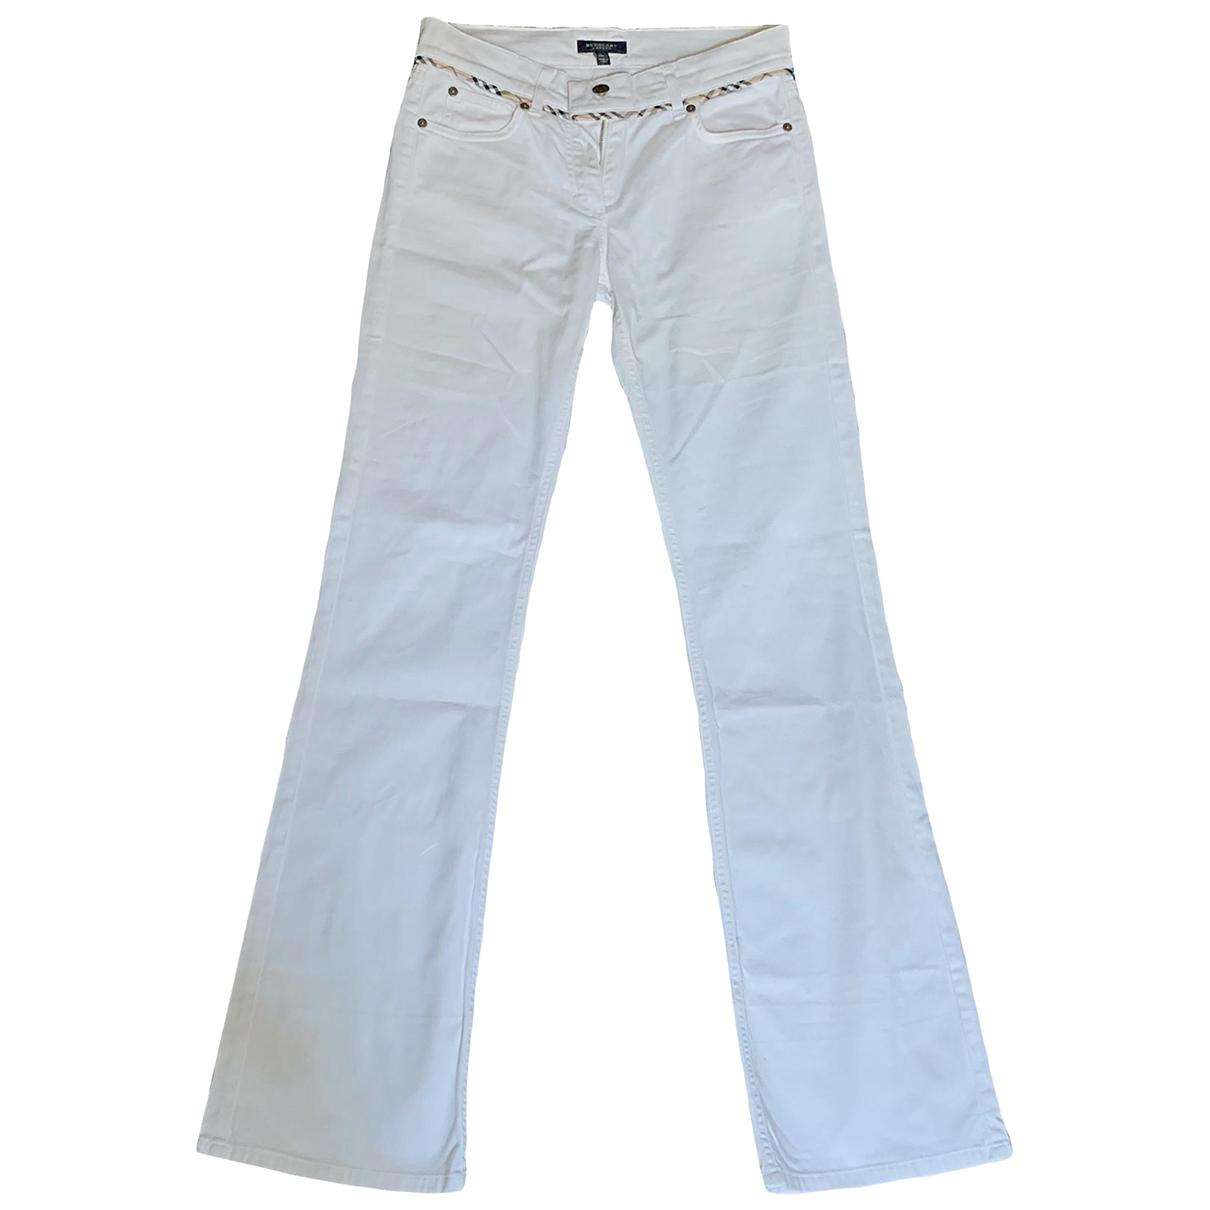 Burberry \N White Cotton - elasthane Jeans for Women 24 US